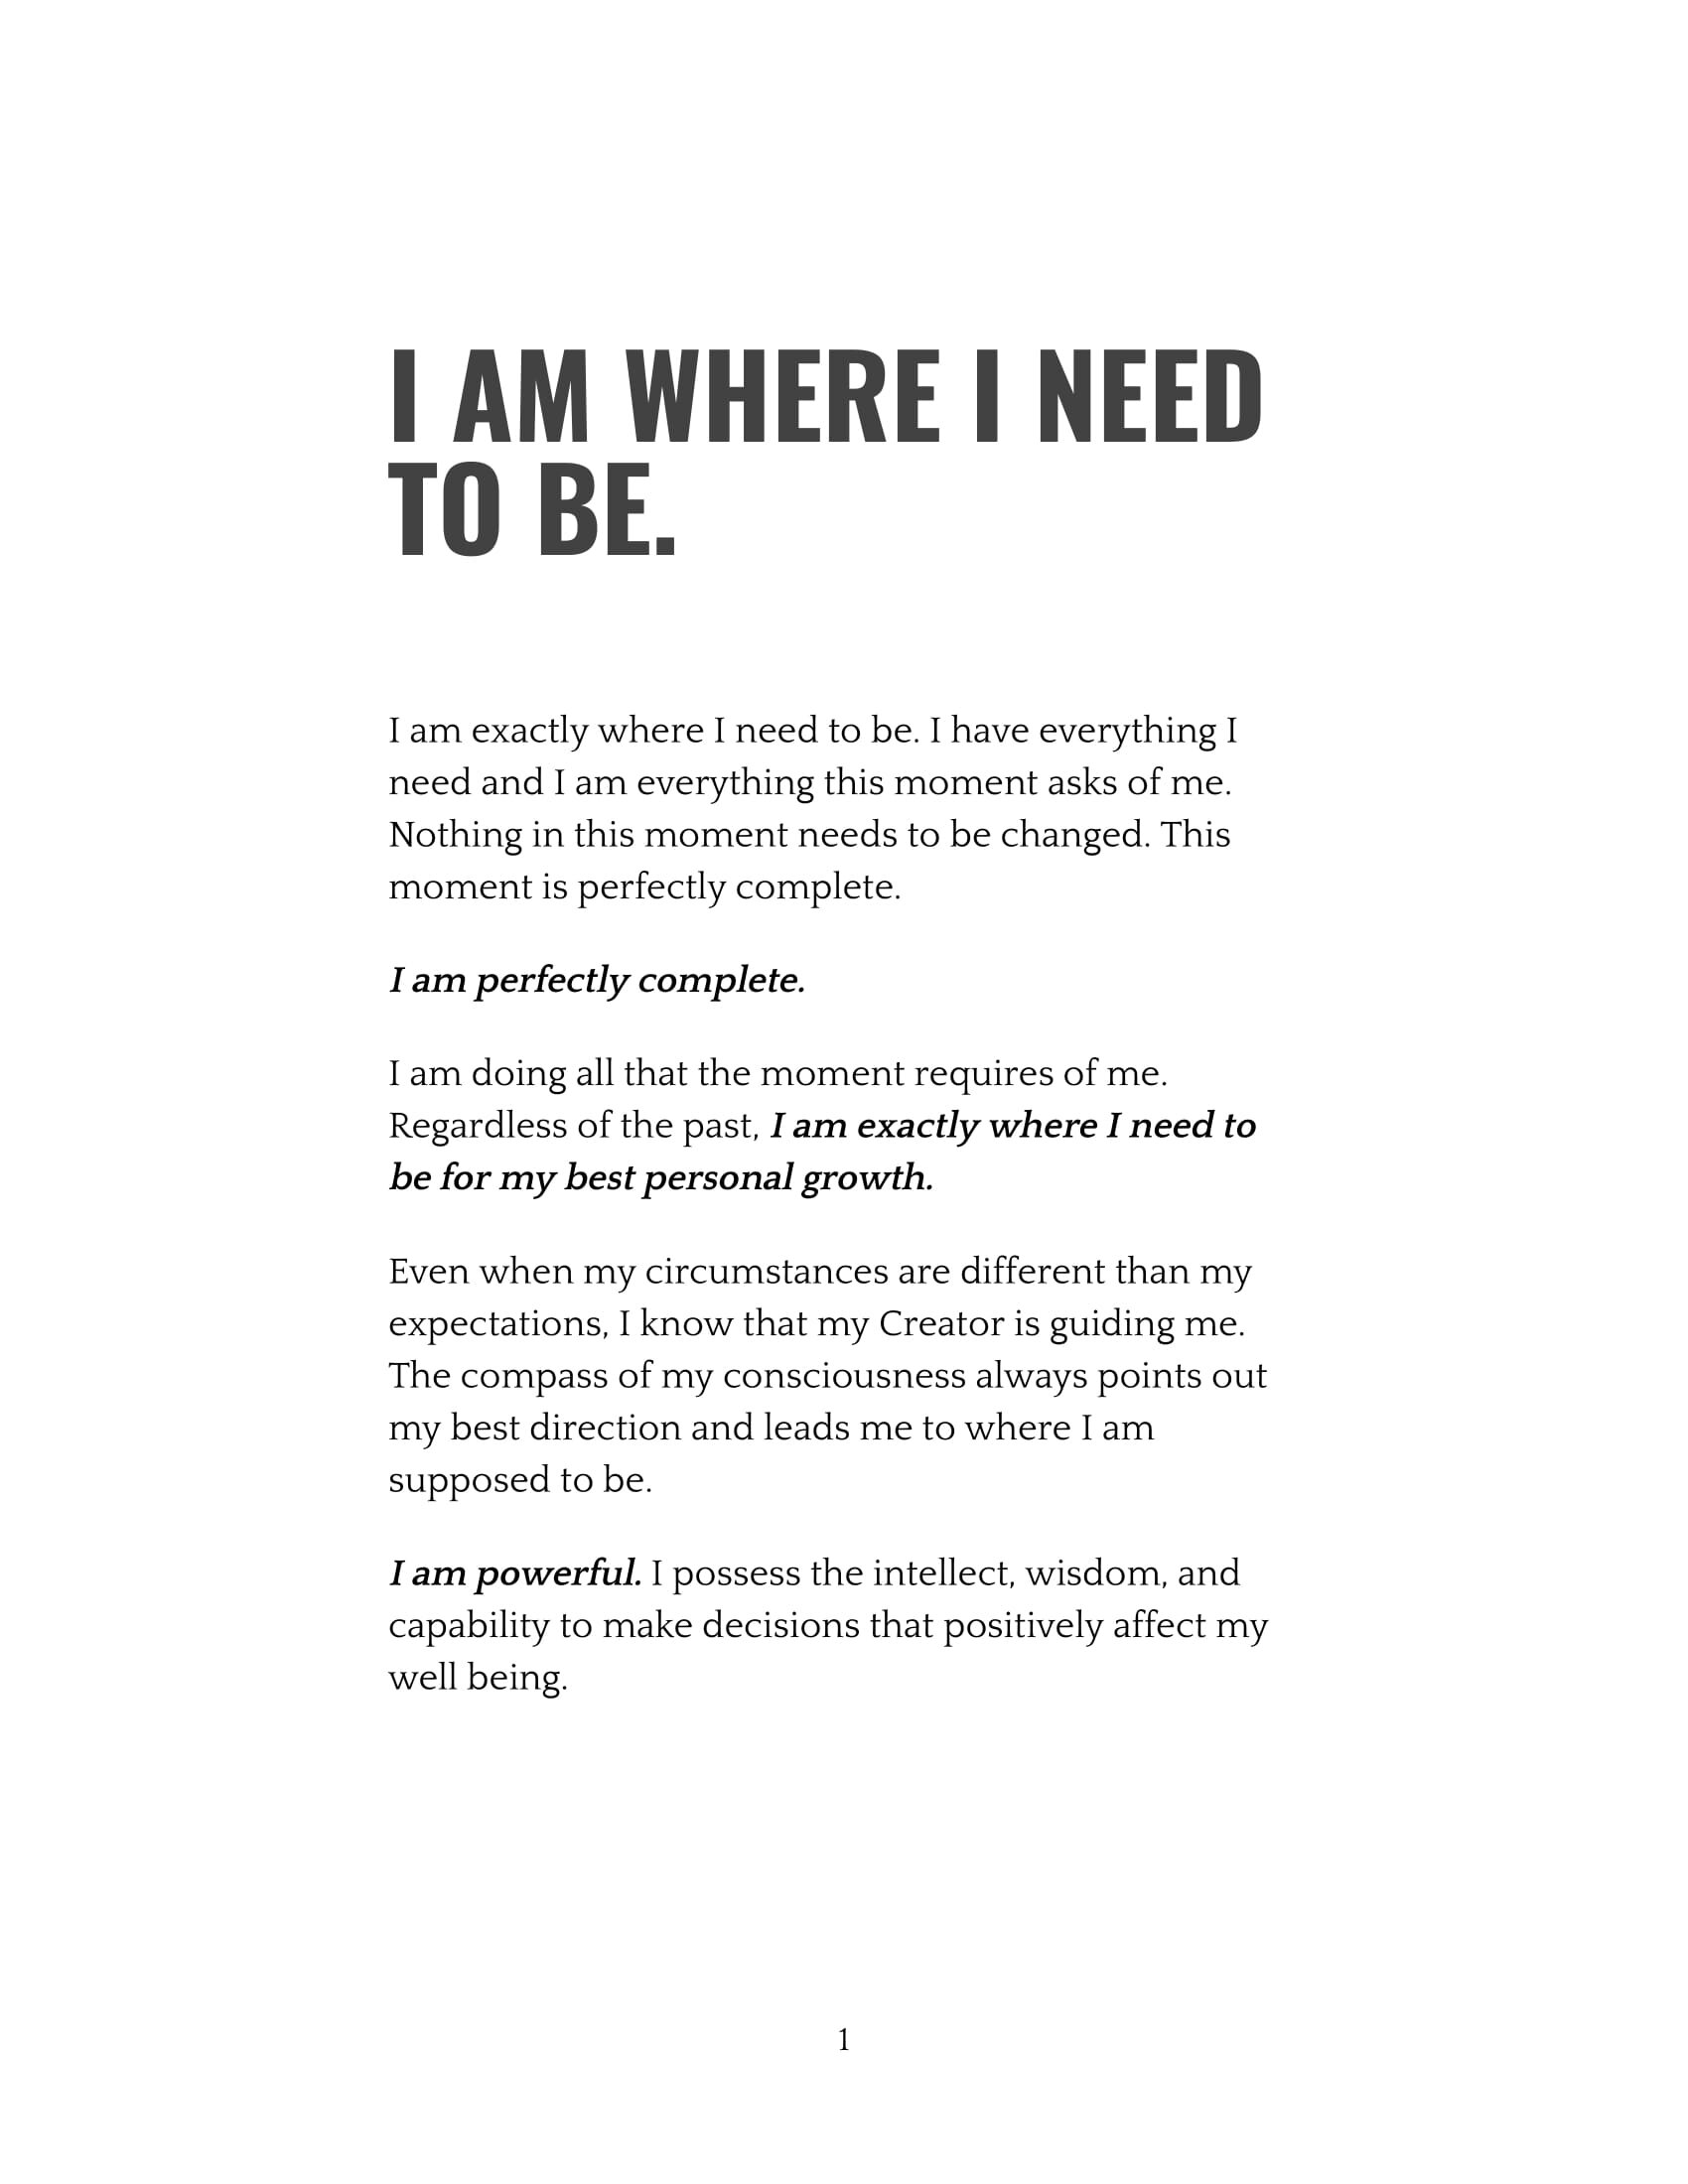 I Am Where I Need To Be-1.jpg